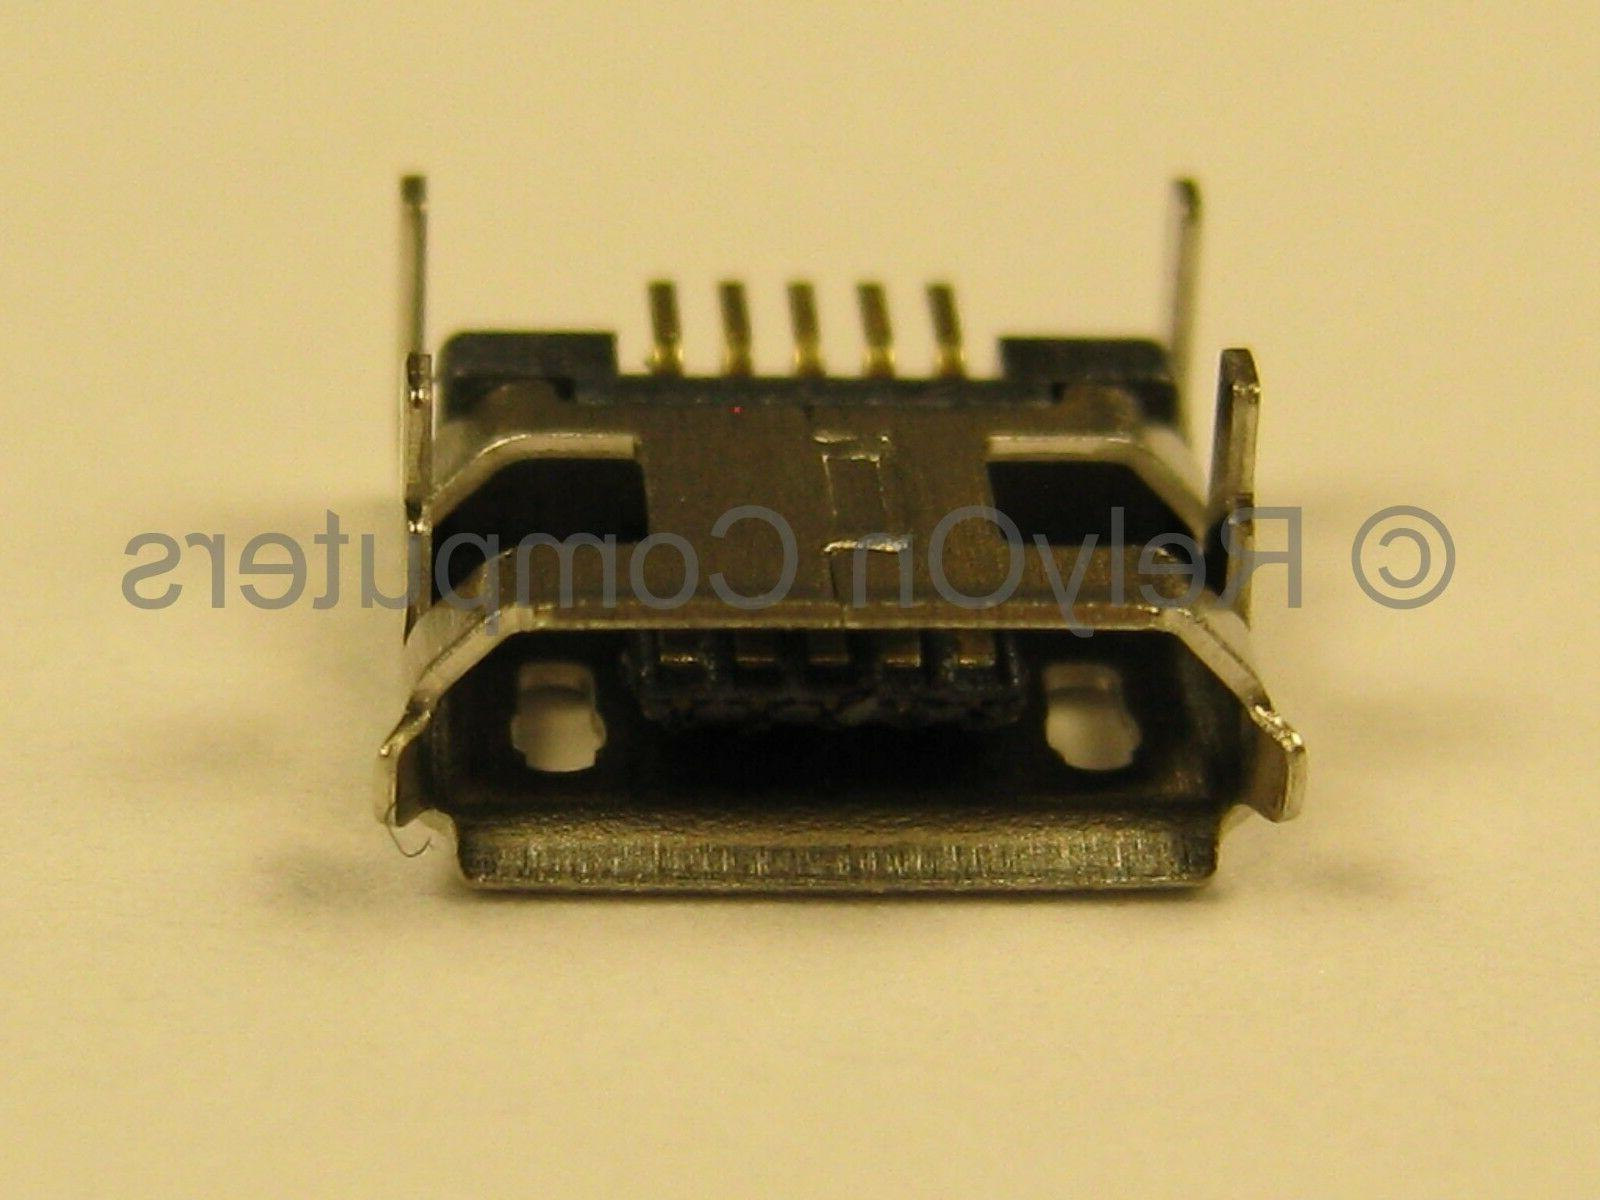 2x USB Charging Port Micro for Altec Lansing